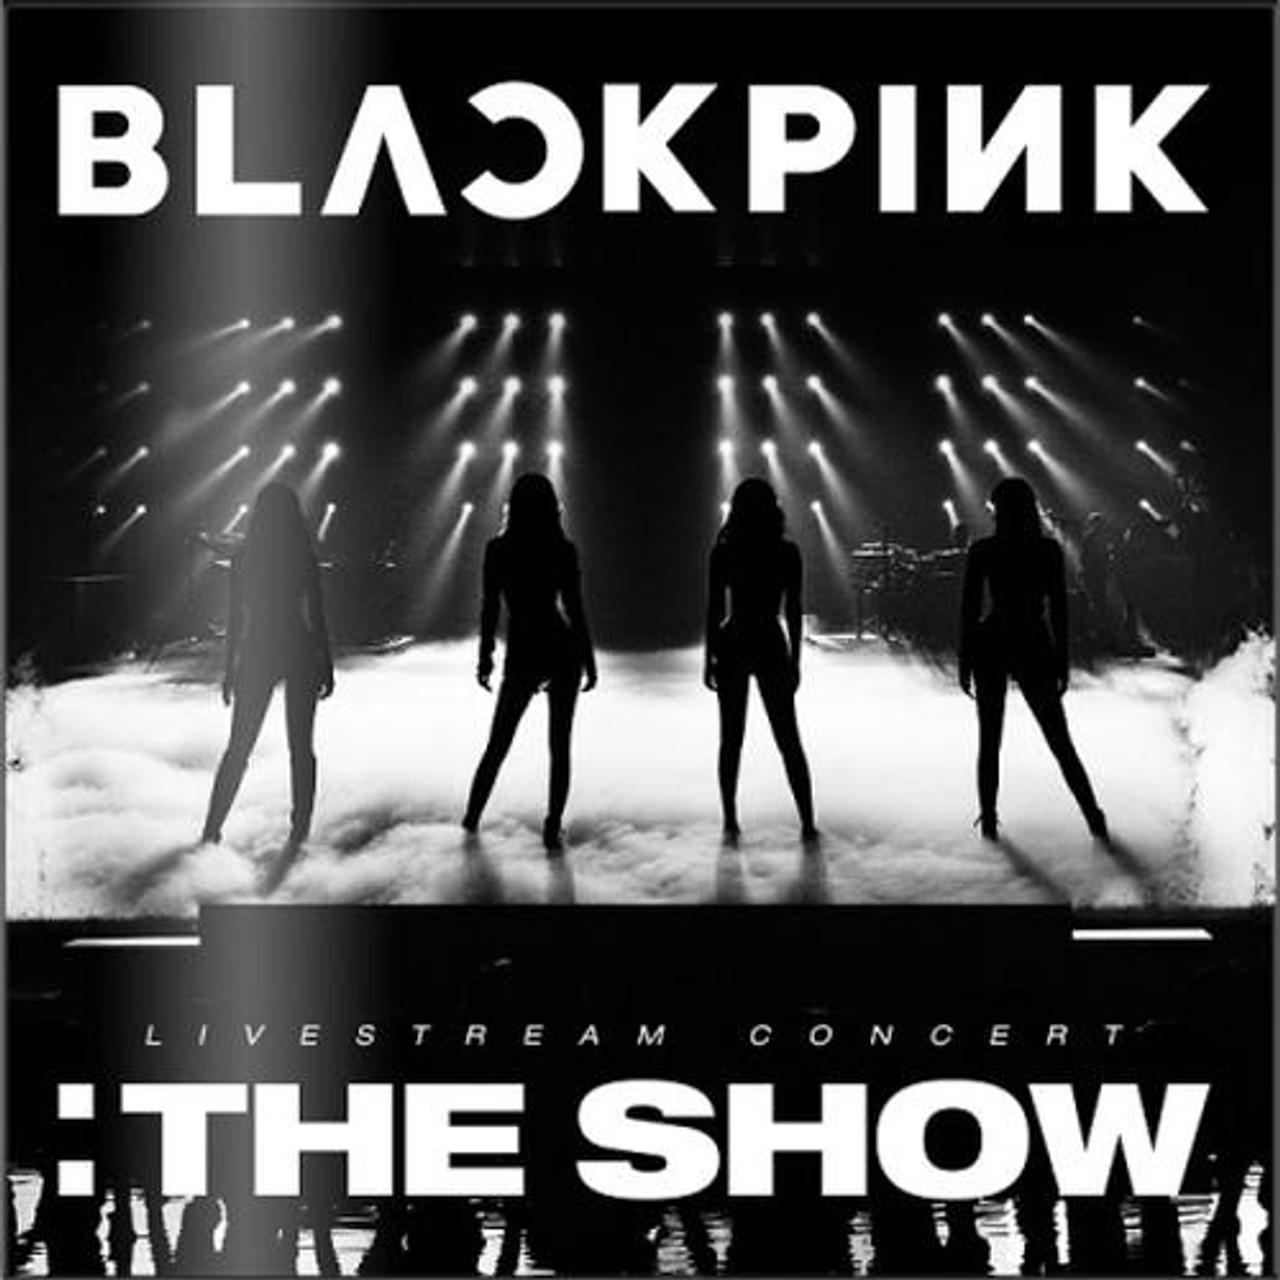 BLACKPINK - BLACKPINK 2021 [THE SHOW] KiT VIDEO